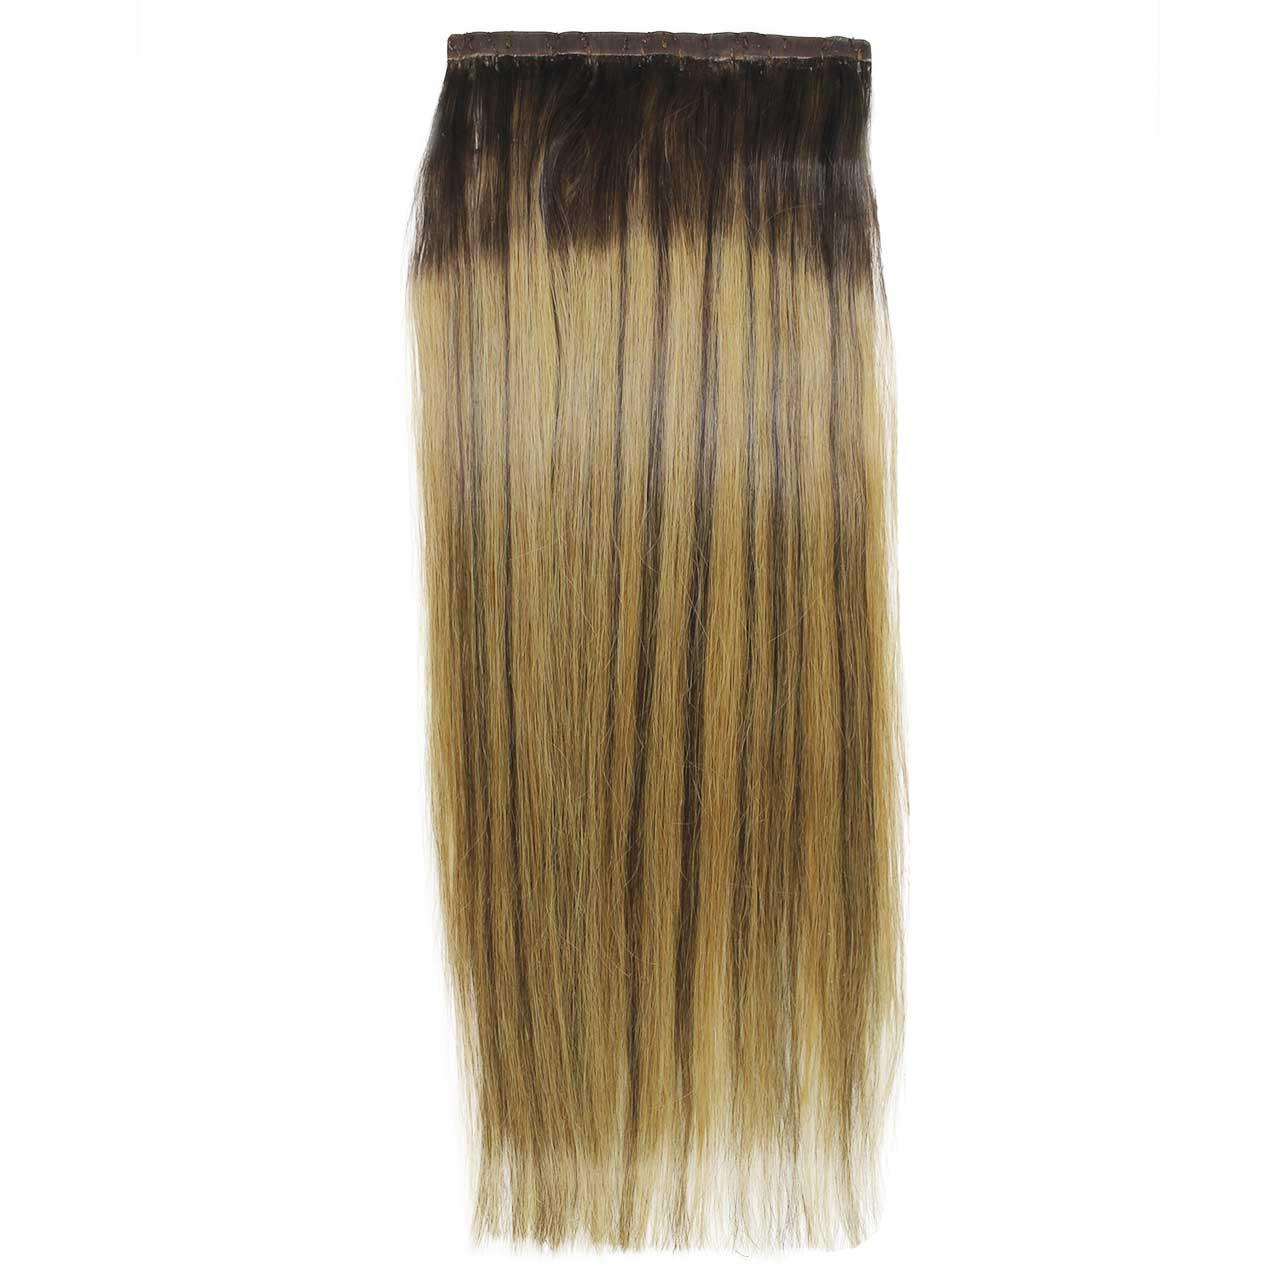 Aplique Tic Tac Ombré Hair 200g Cabelos Humanos Naturais Liso